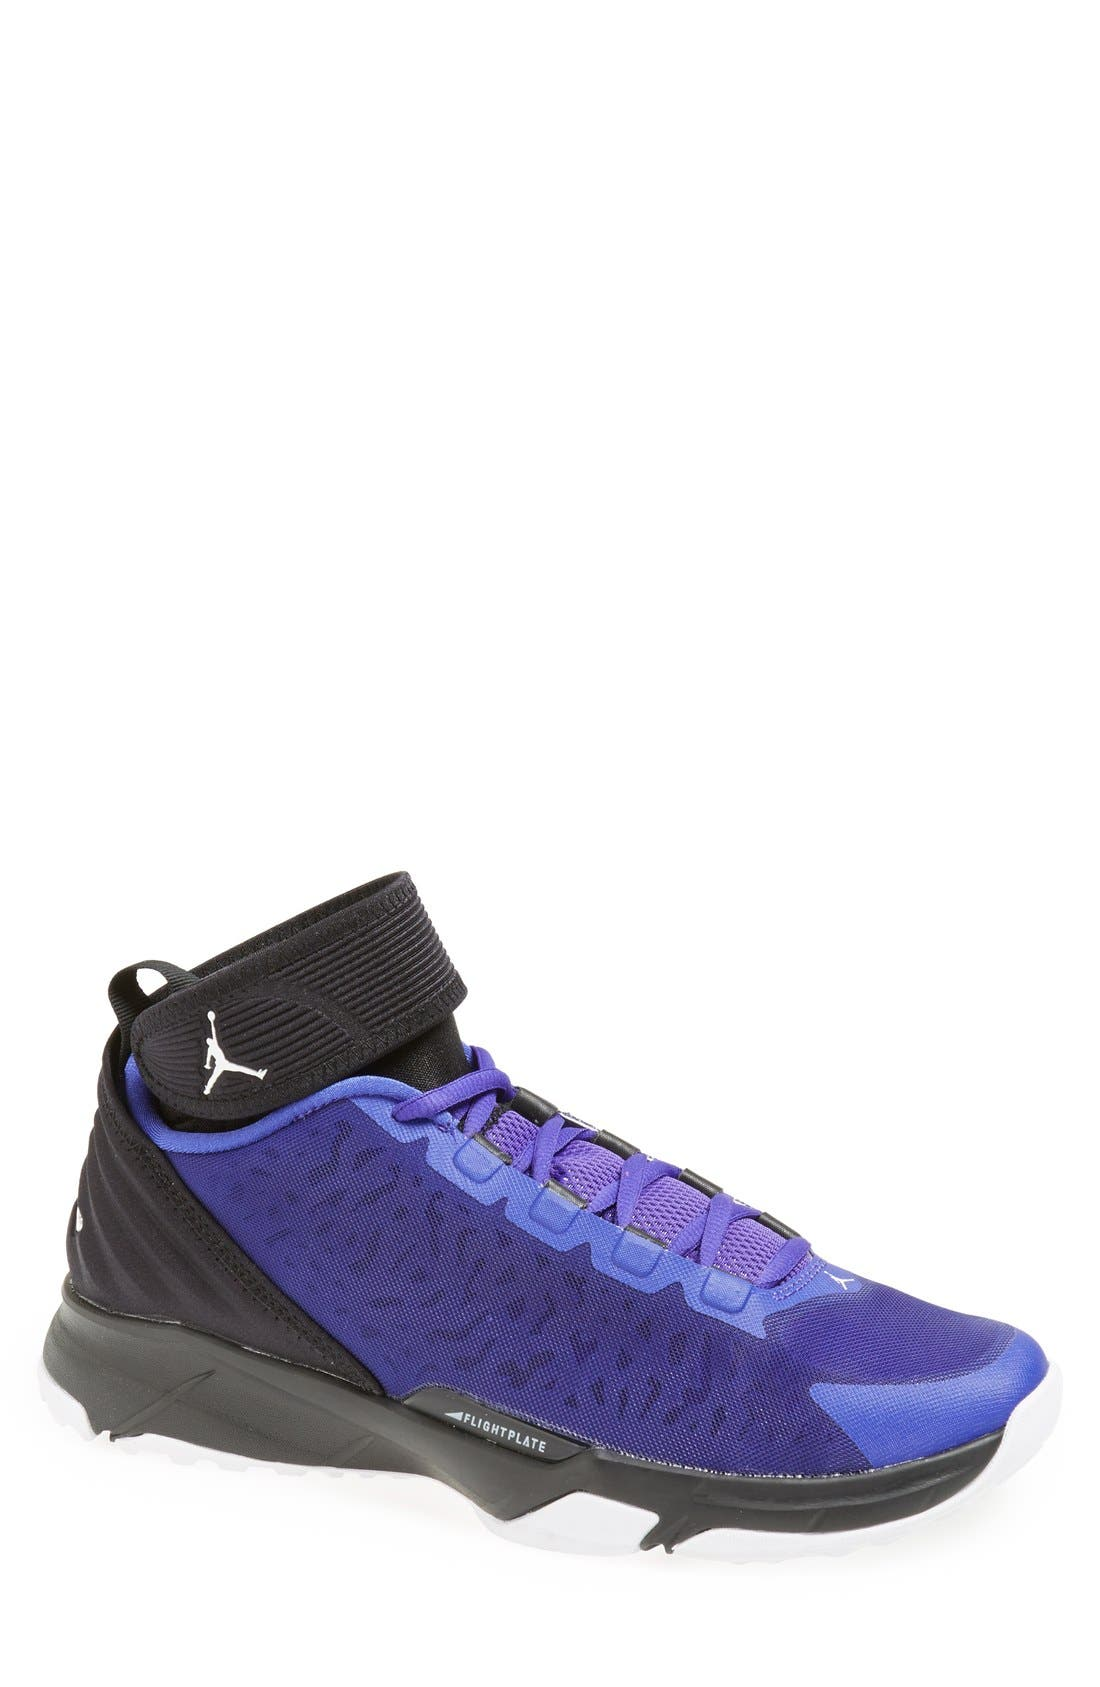 Alternate Image 1 Selected - Nike 'Jordan Dominate Pro 2' Training Shoe (Men)